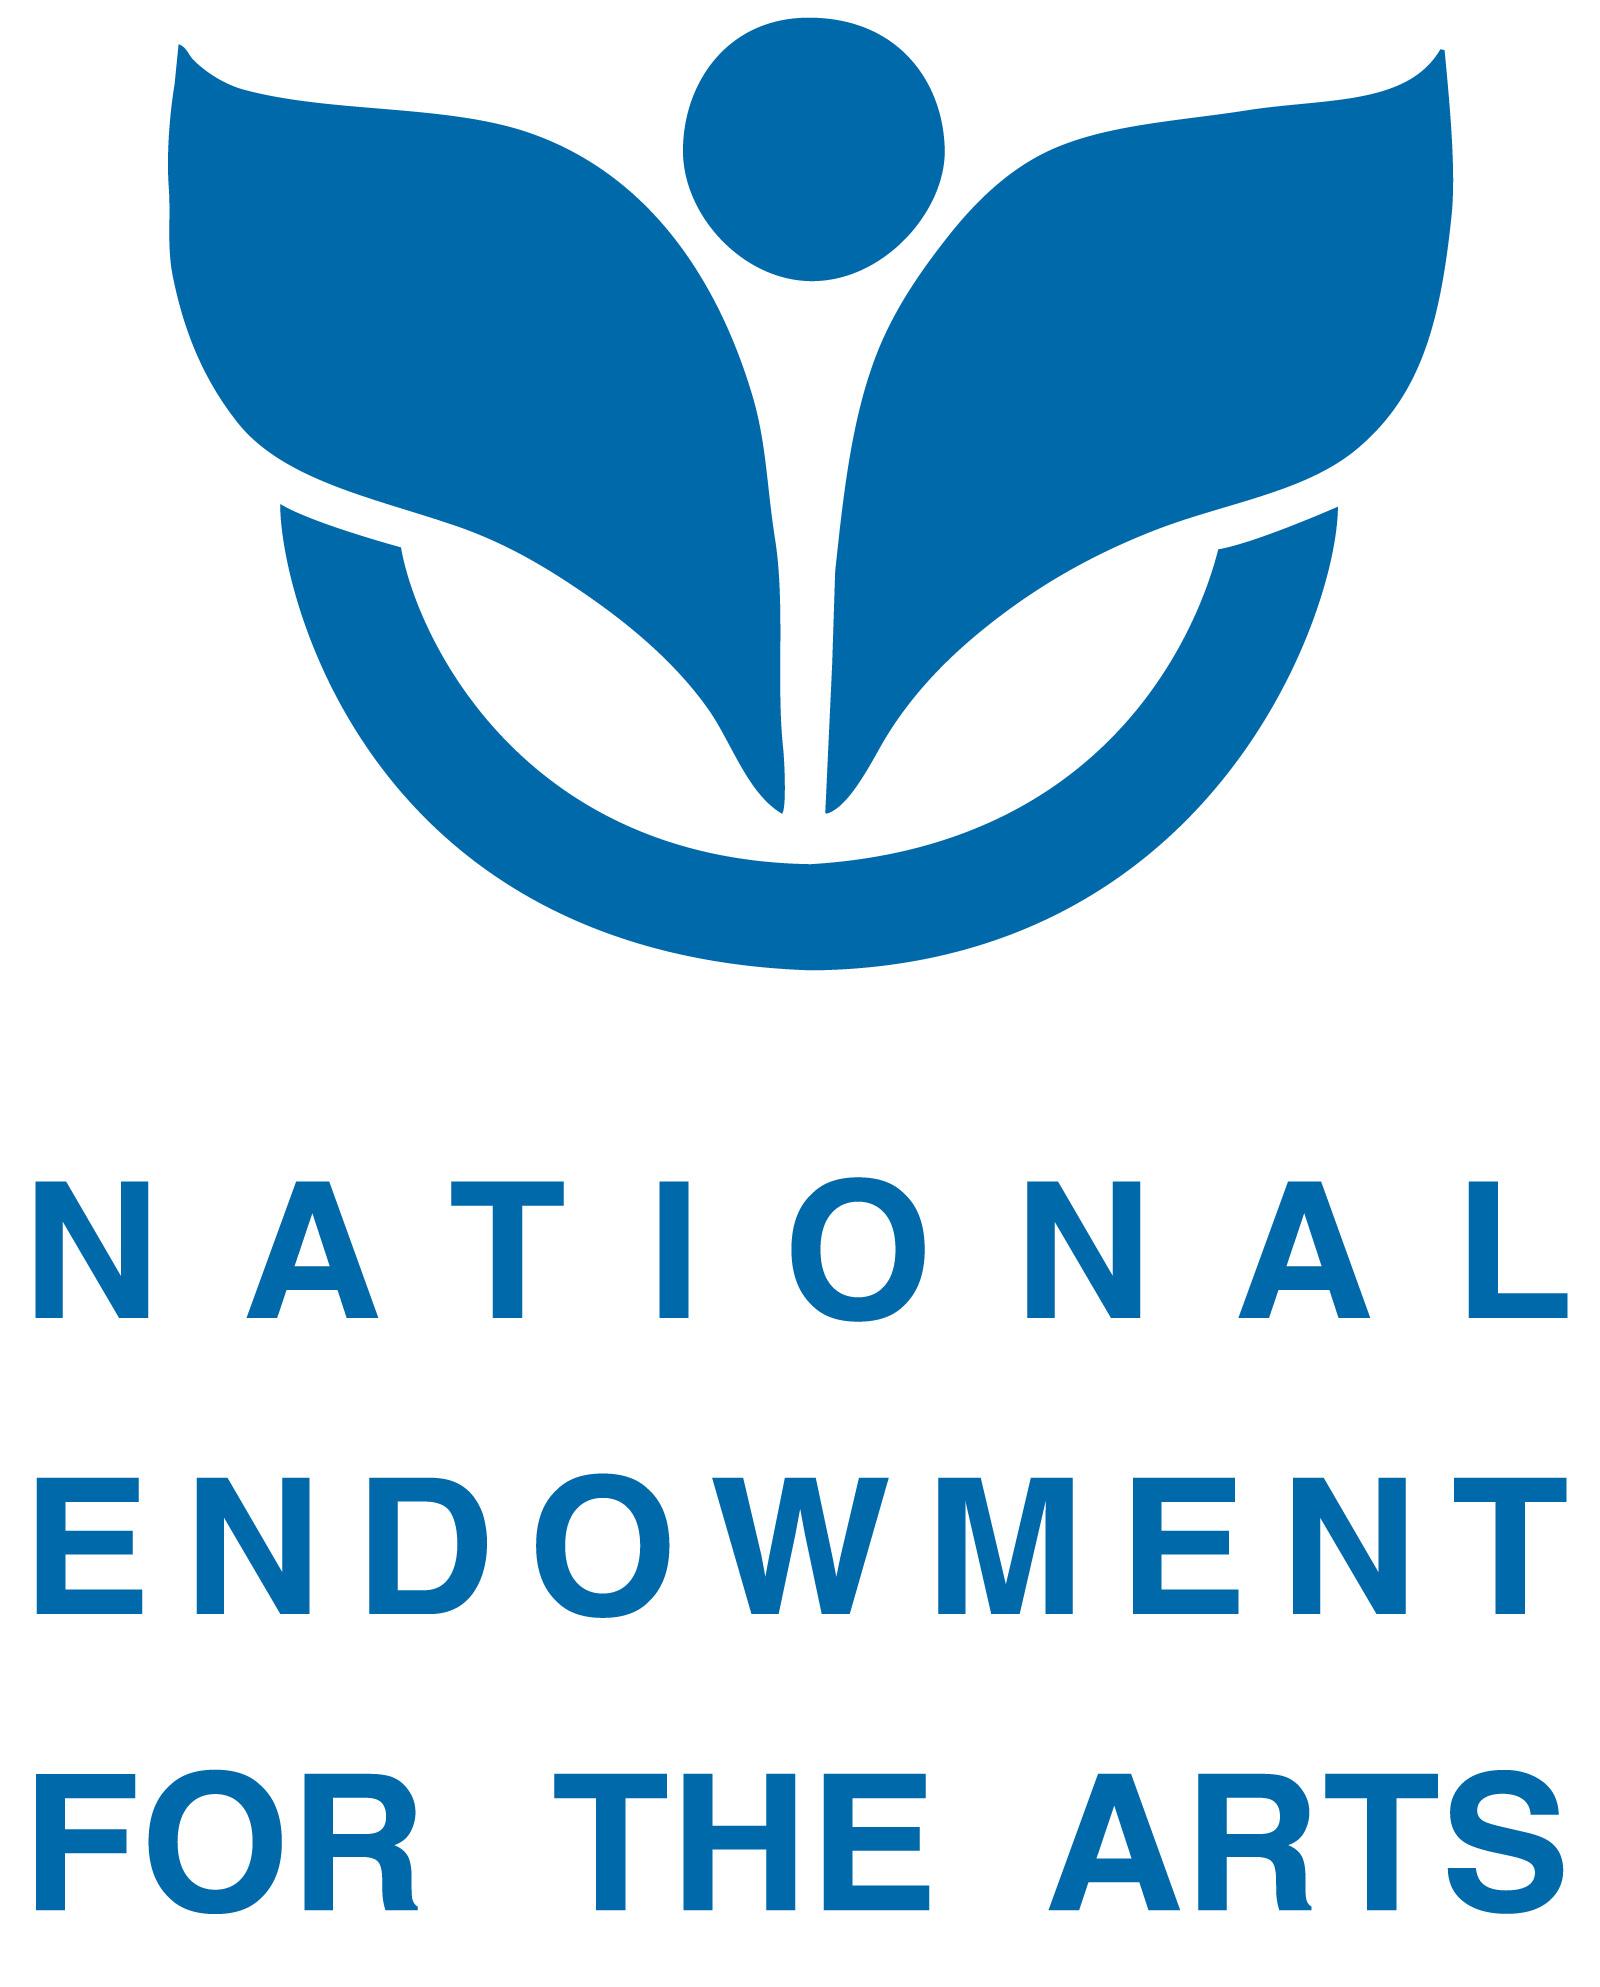 NATIONAL ENDOWMENT FOR THE ARTS-1.jpg